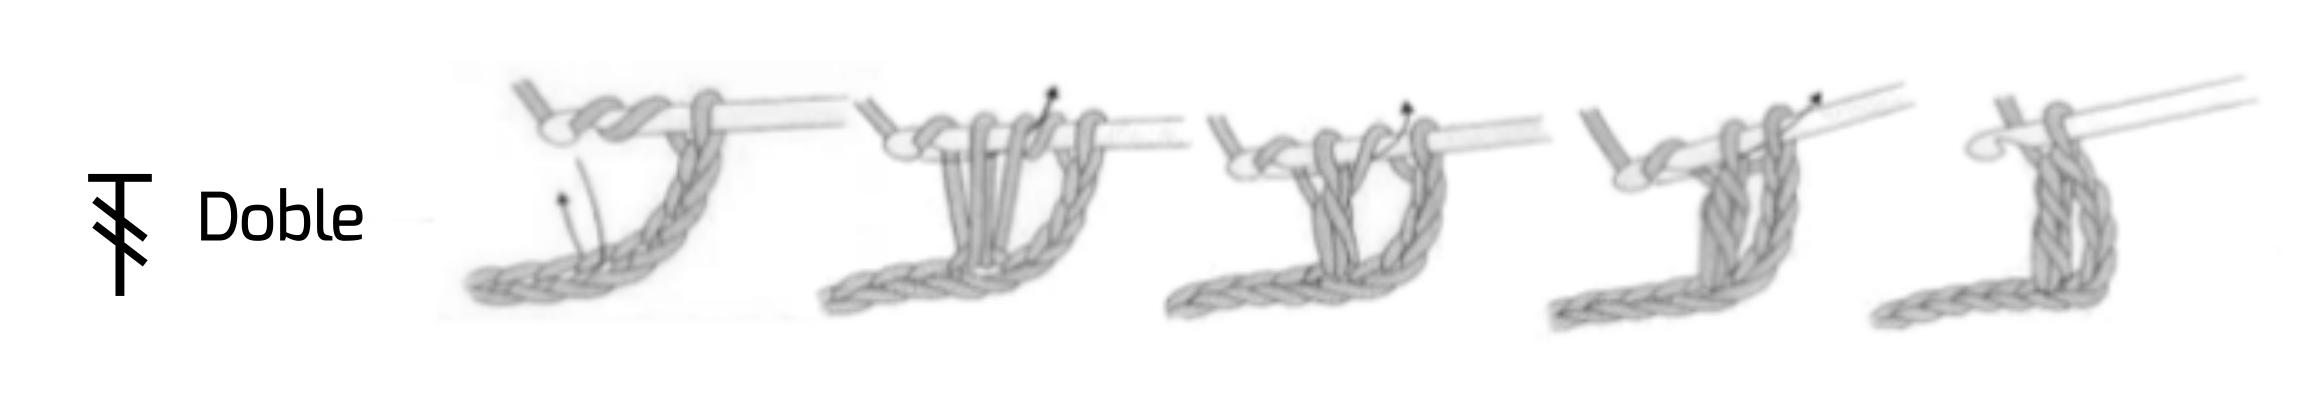 punto-alto-doble-triple-crochet